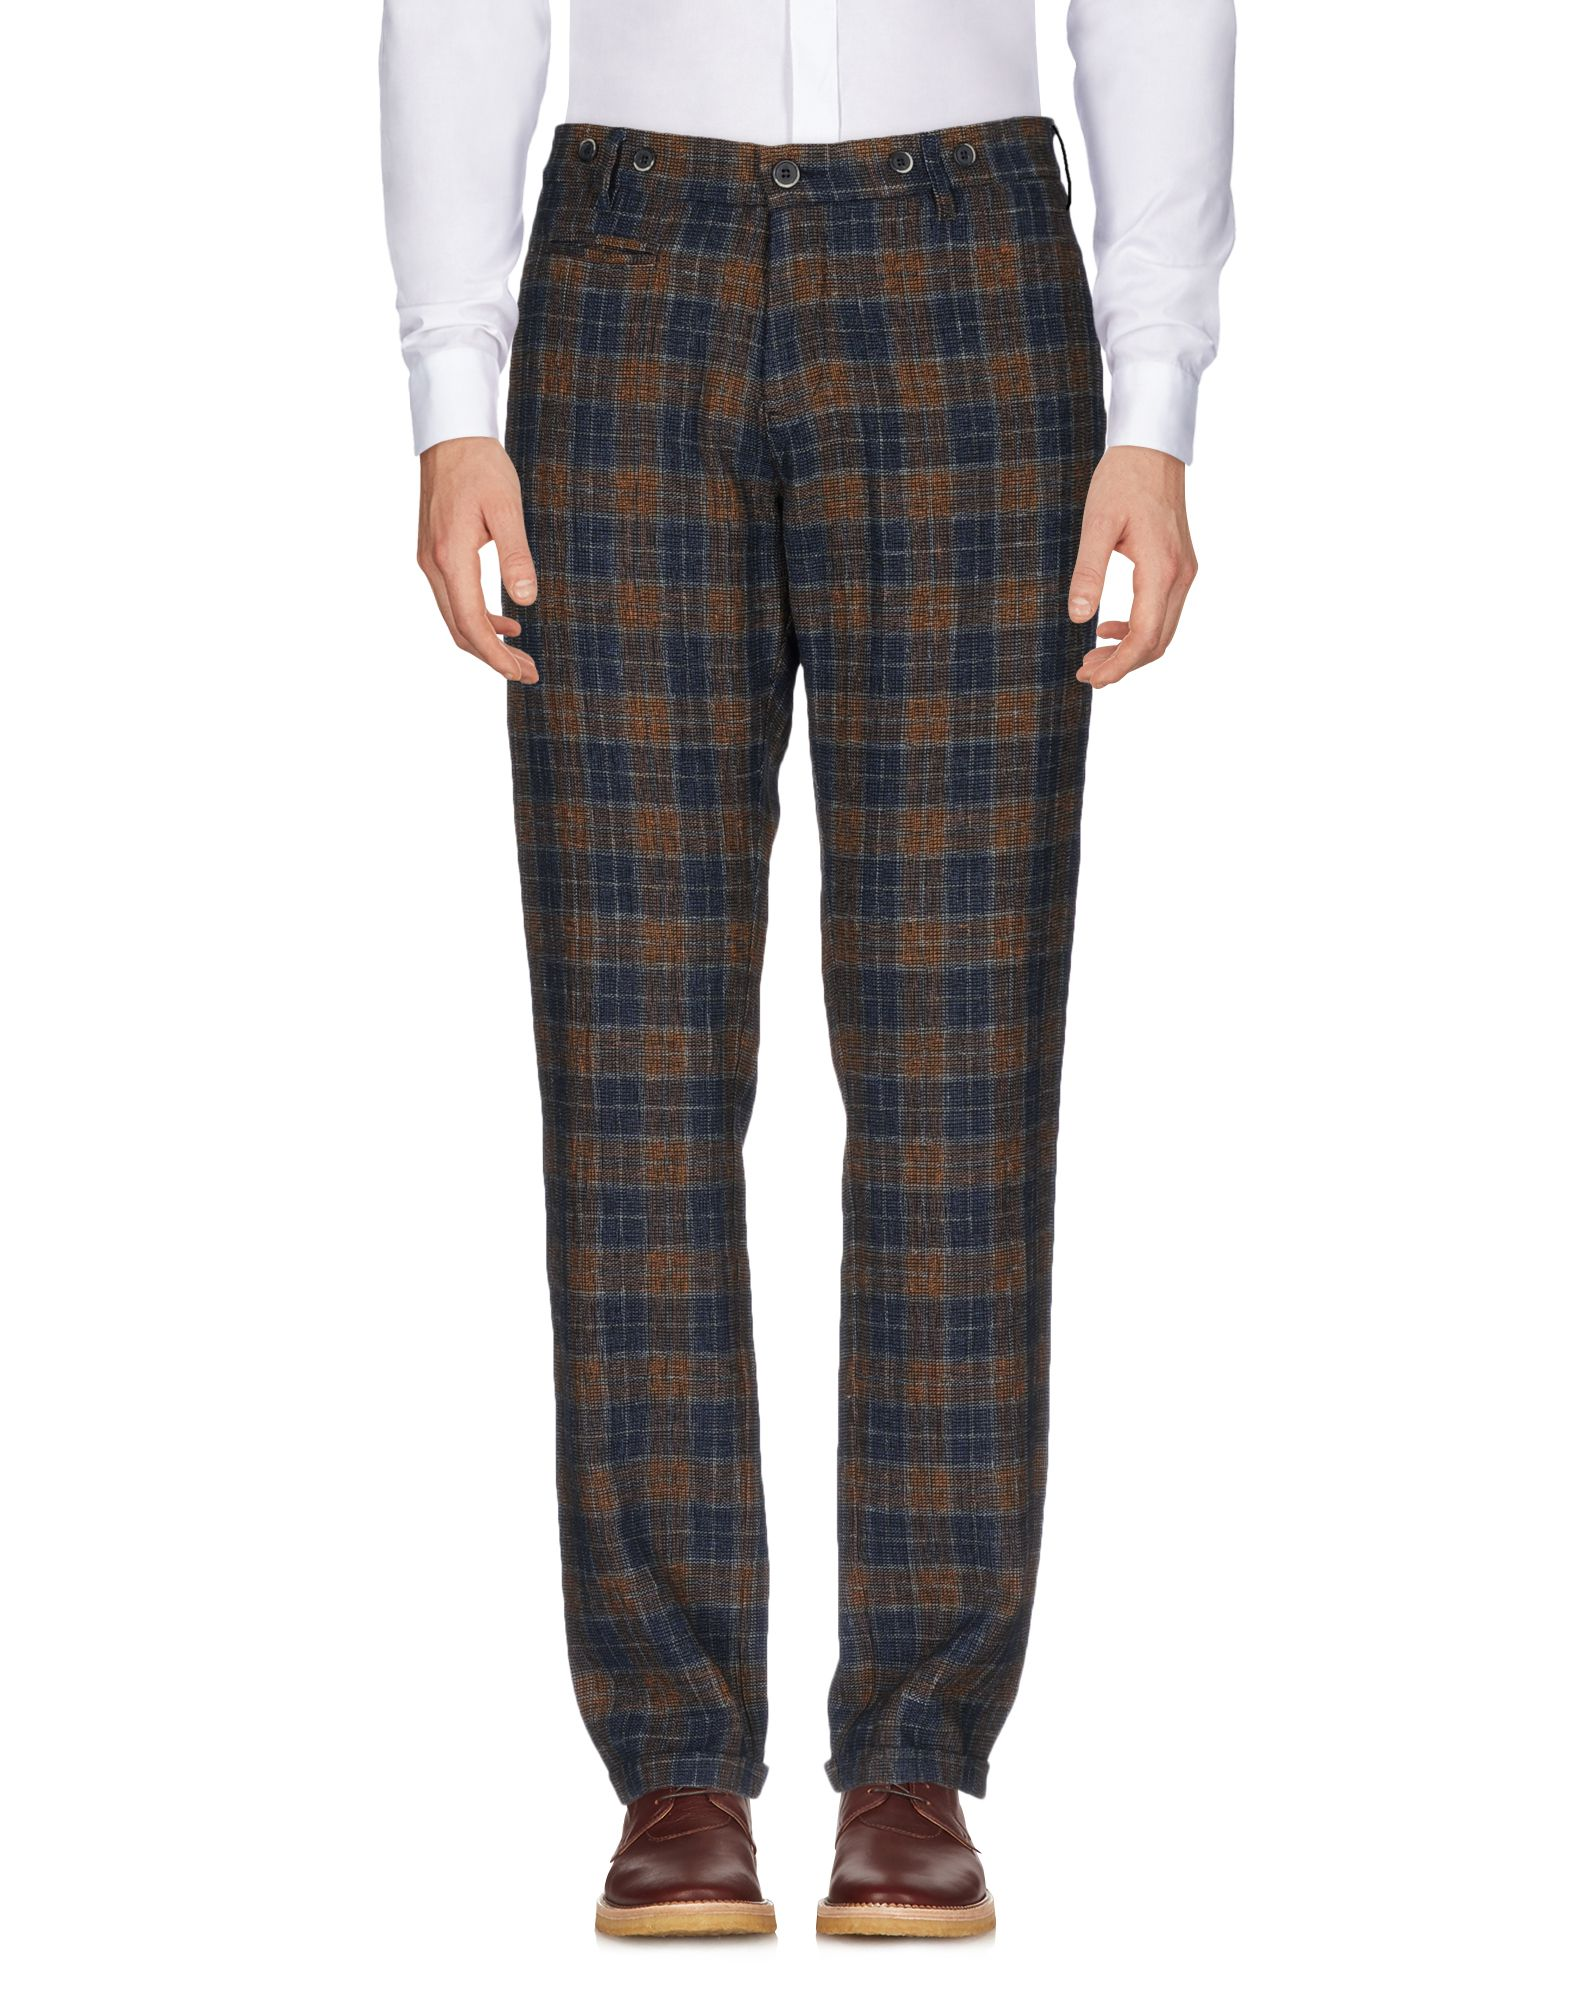 Pantalone Barena Uomo - Acquista online su